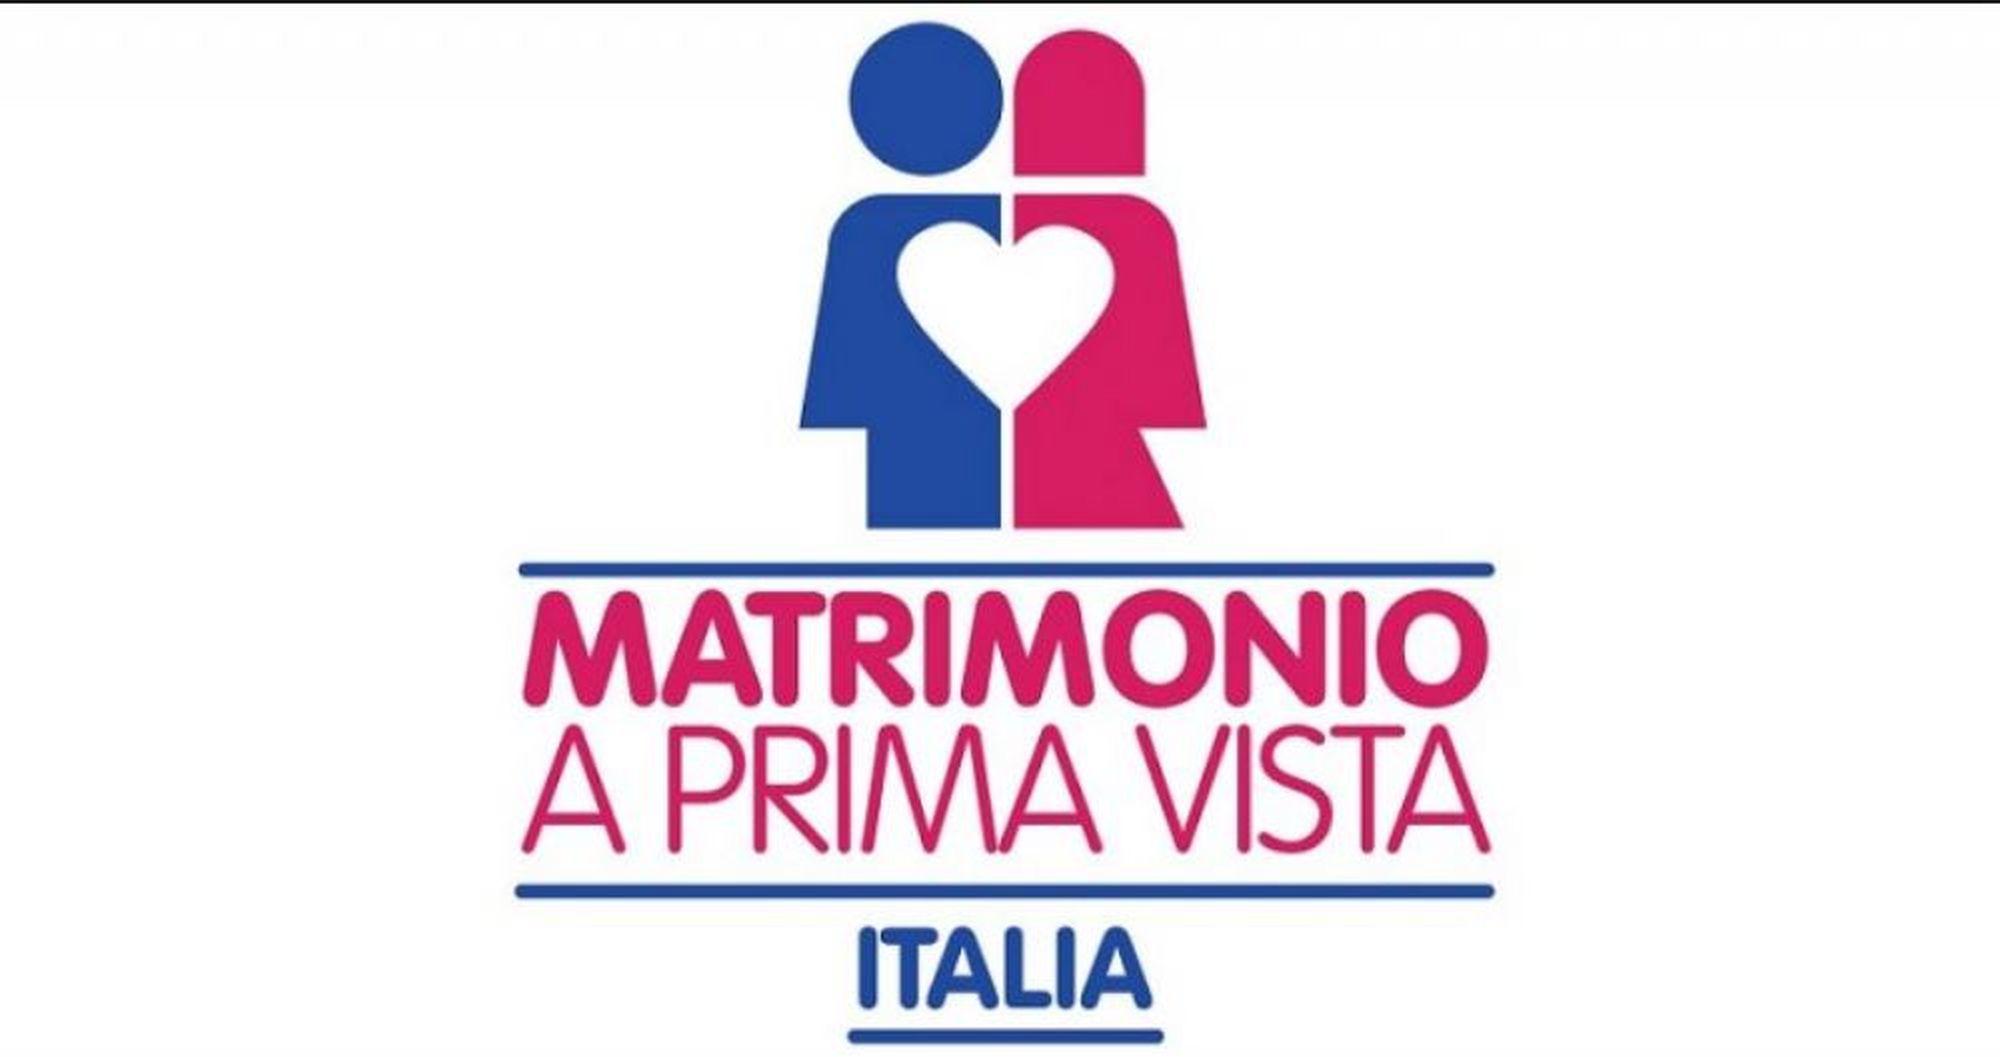 Matrimonio a prima vista Italia 5: protagonisti